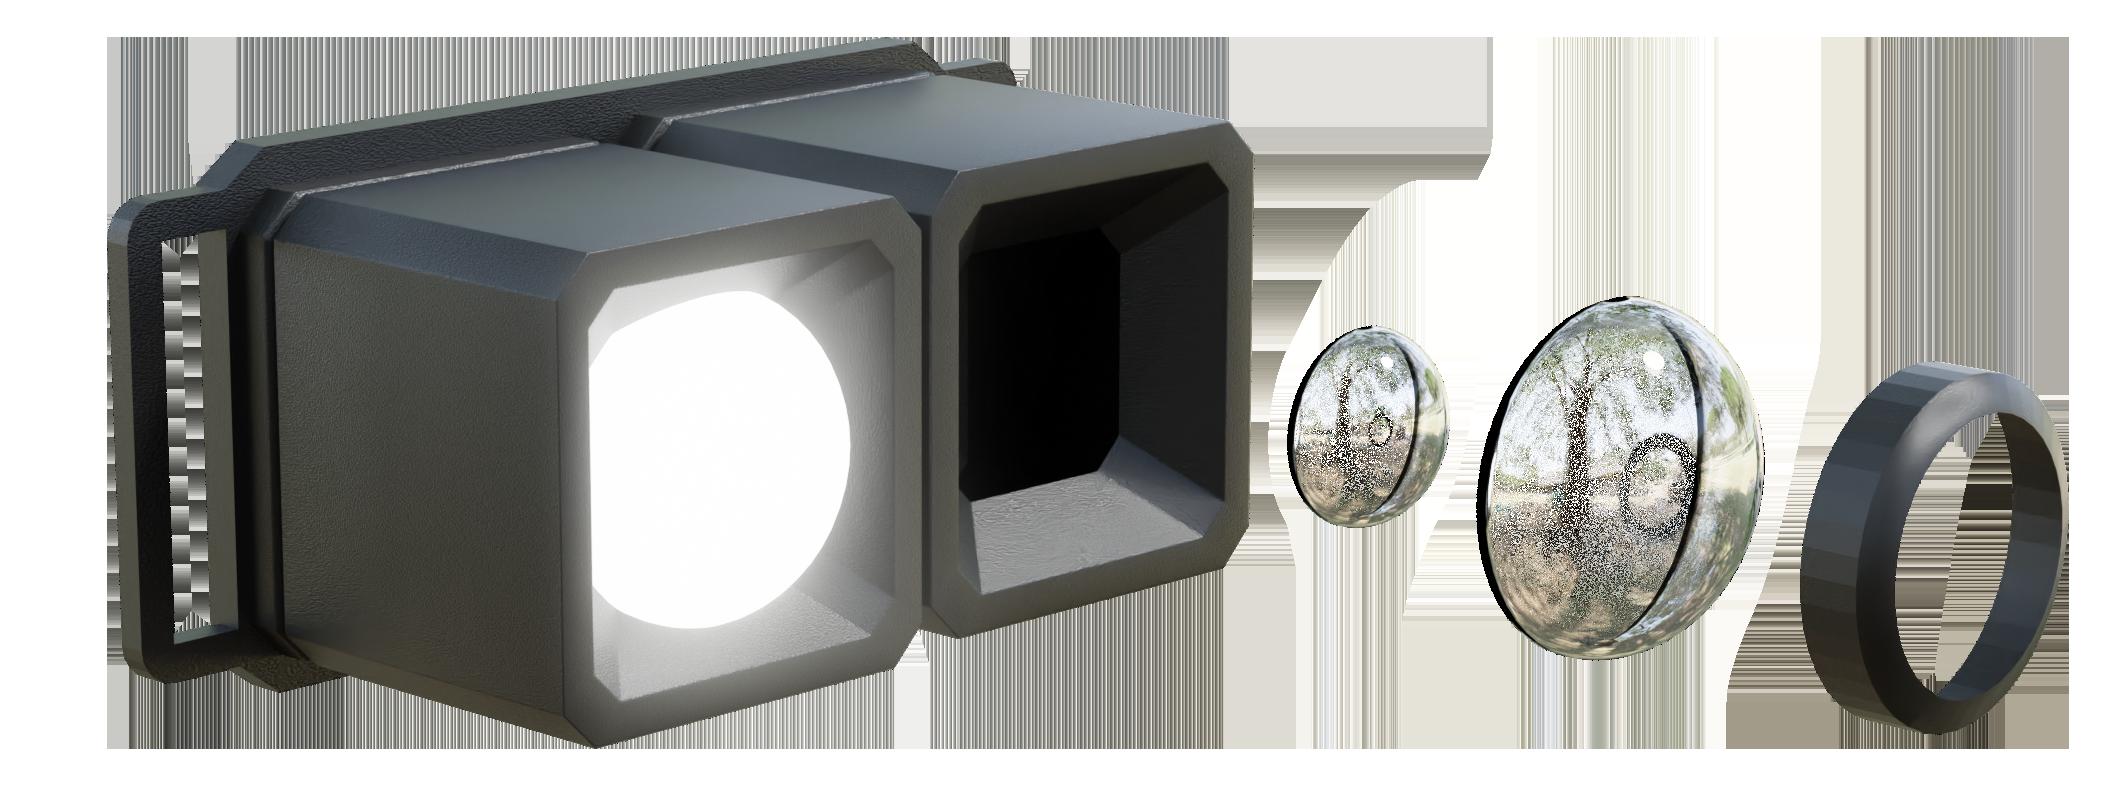 lamp-video1-glow